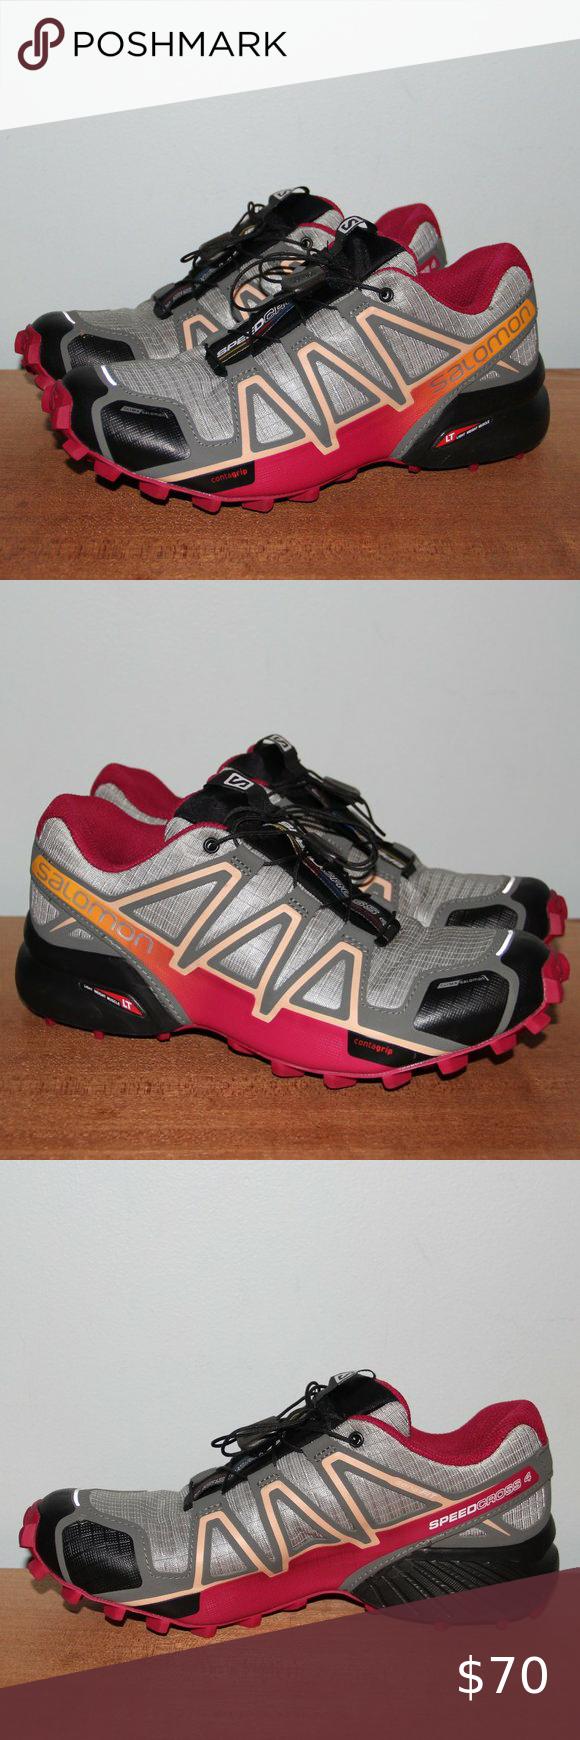 Trail running shoes women, Womens